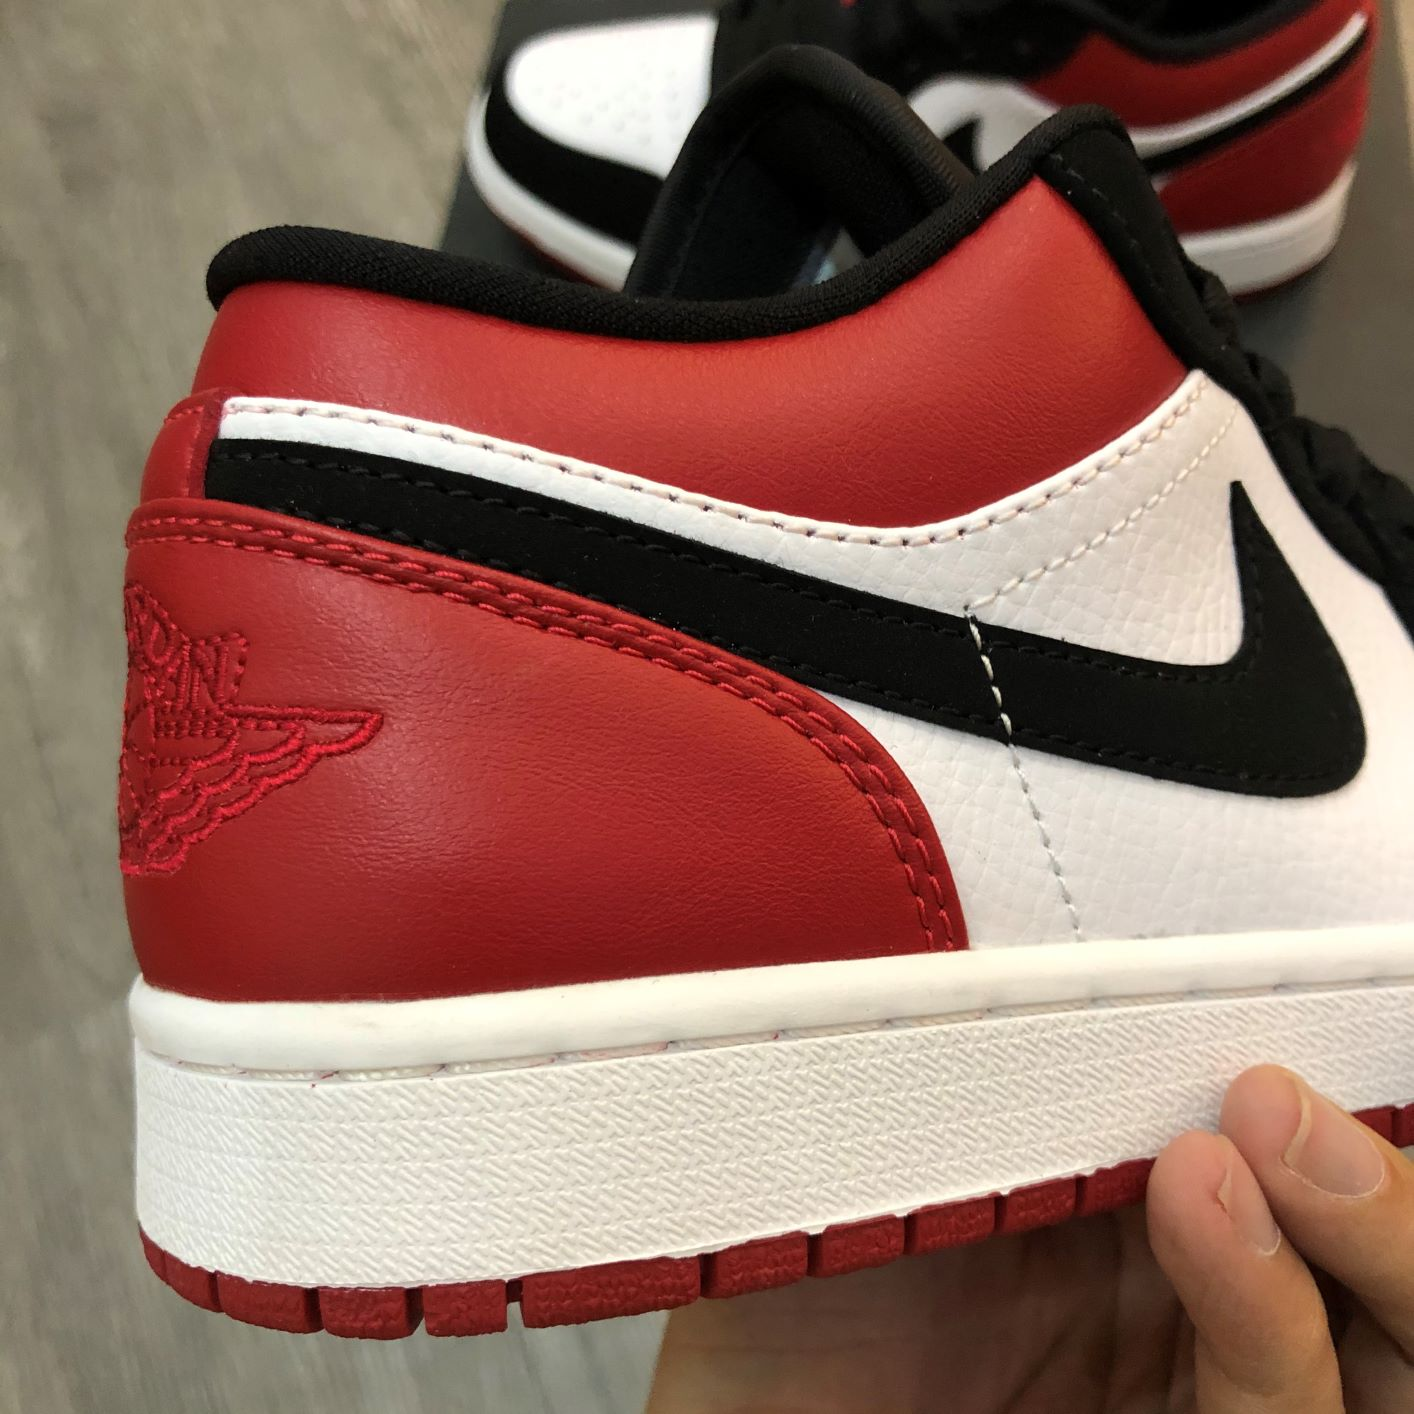 Giày Jordan1 Low Black Toe